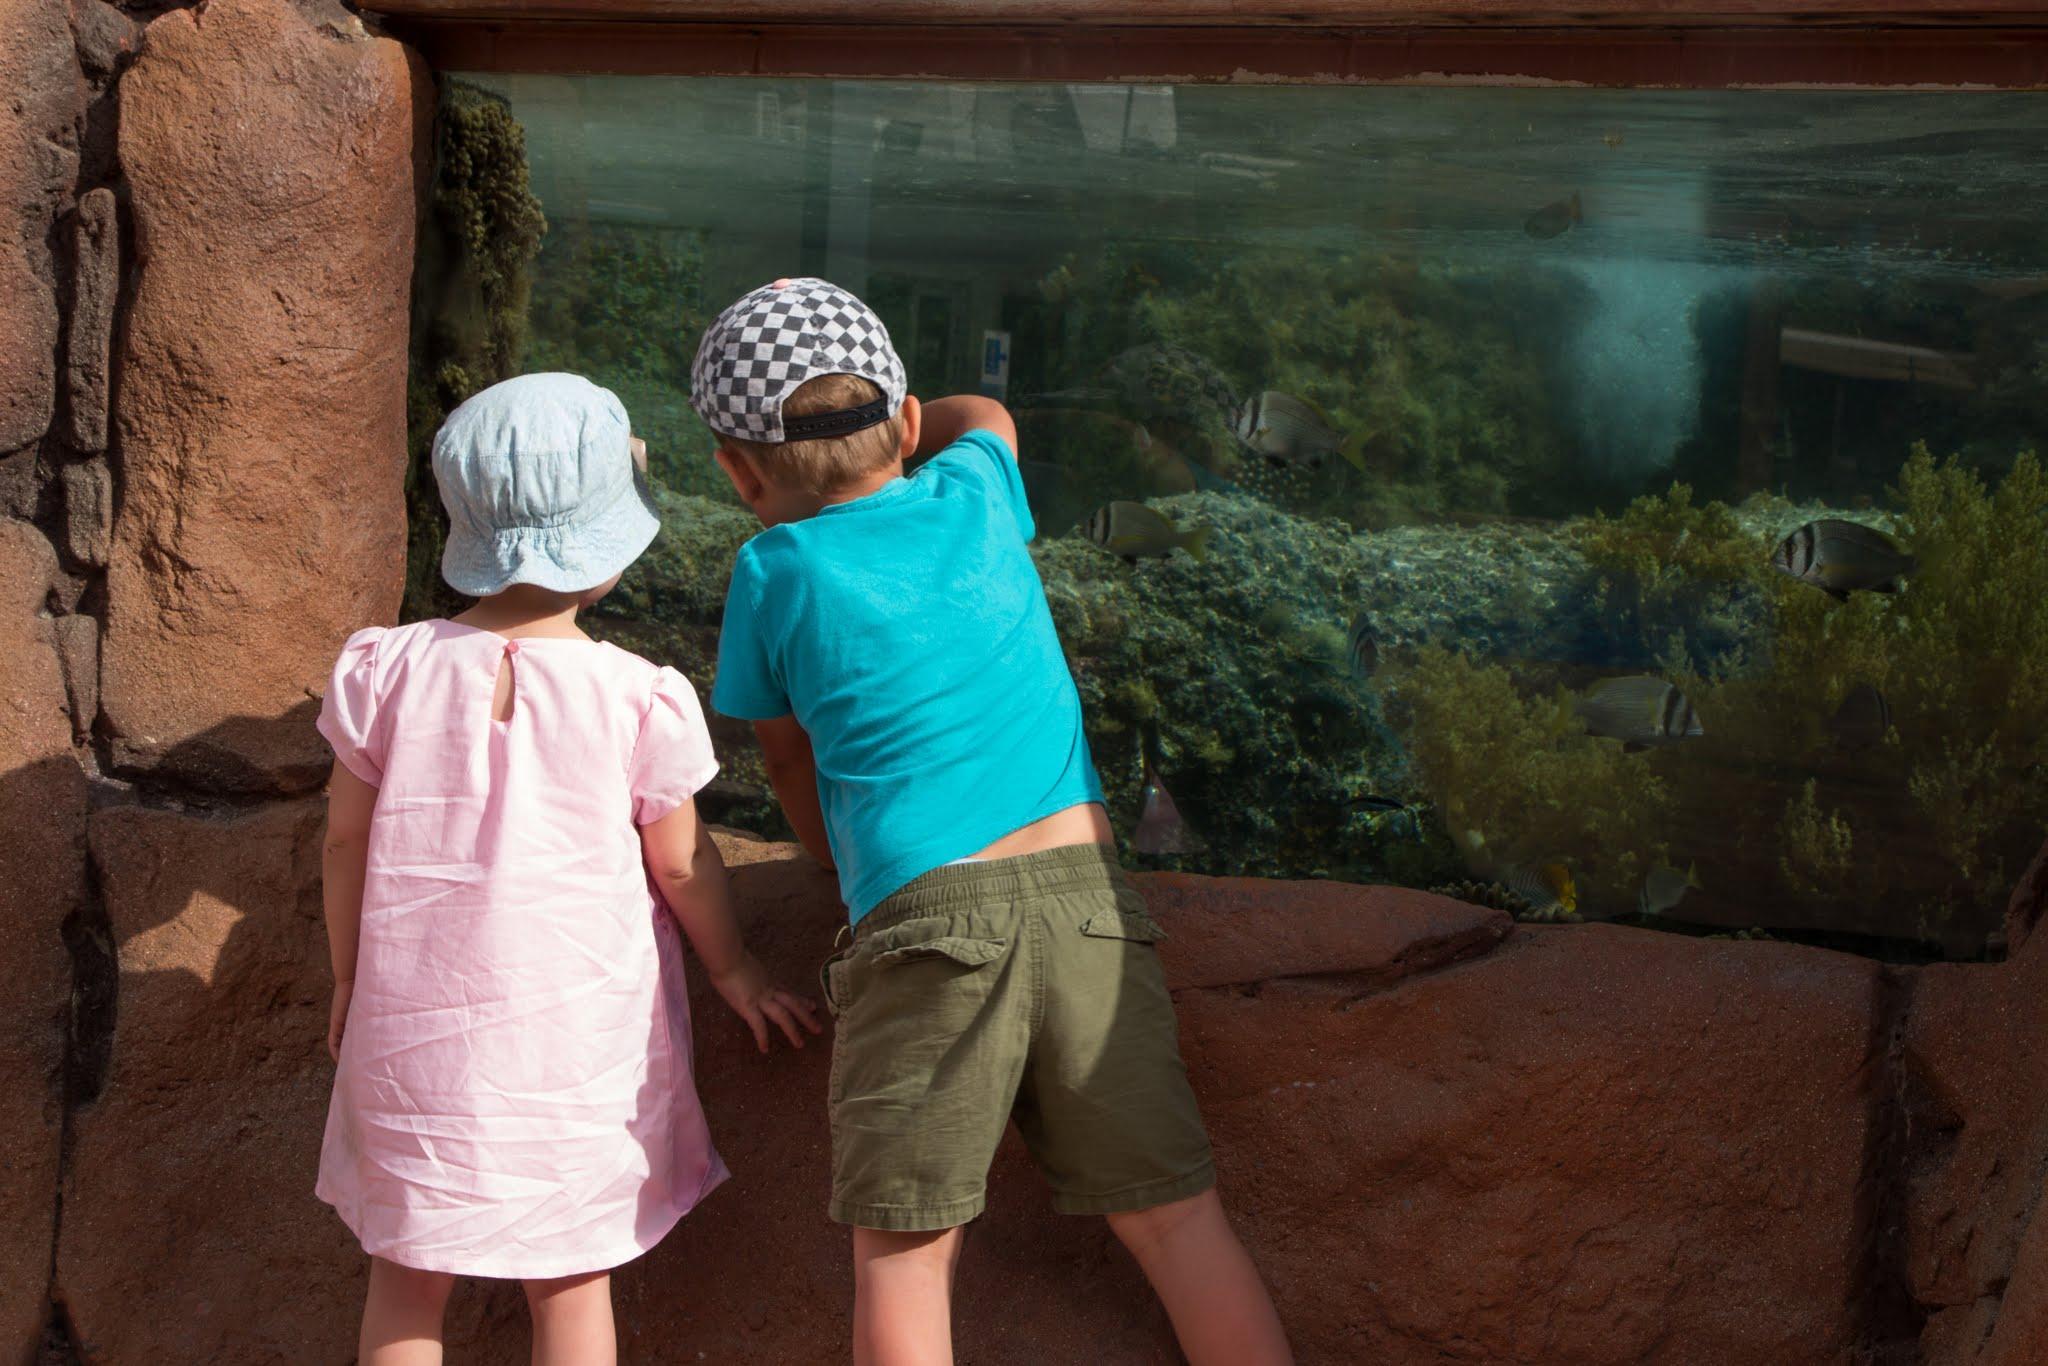 Ejlat z dziećmi, oceanarium